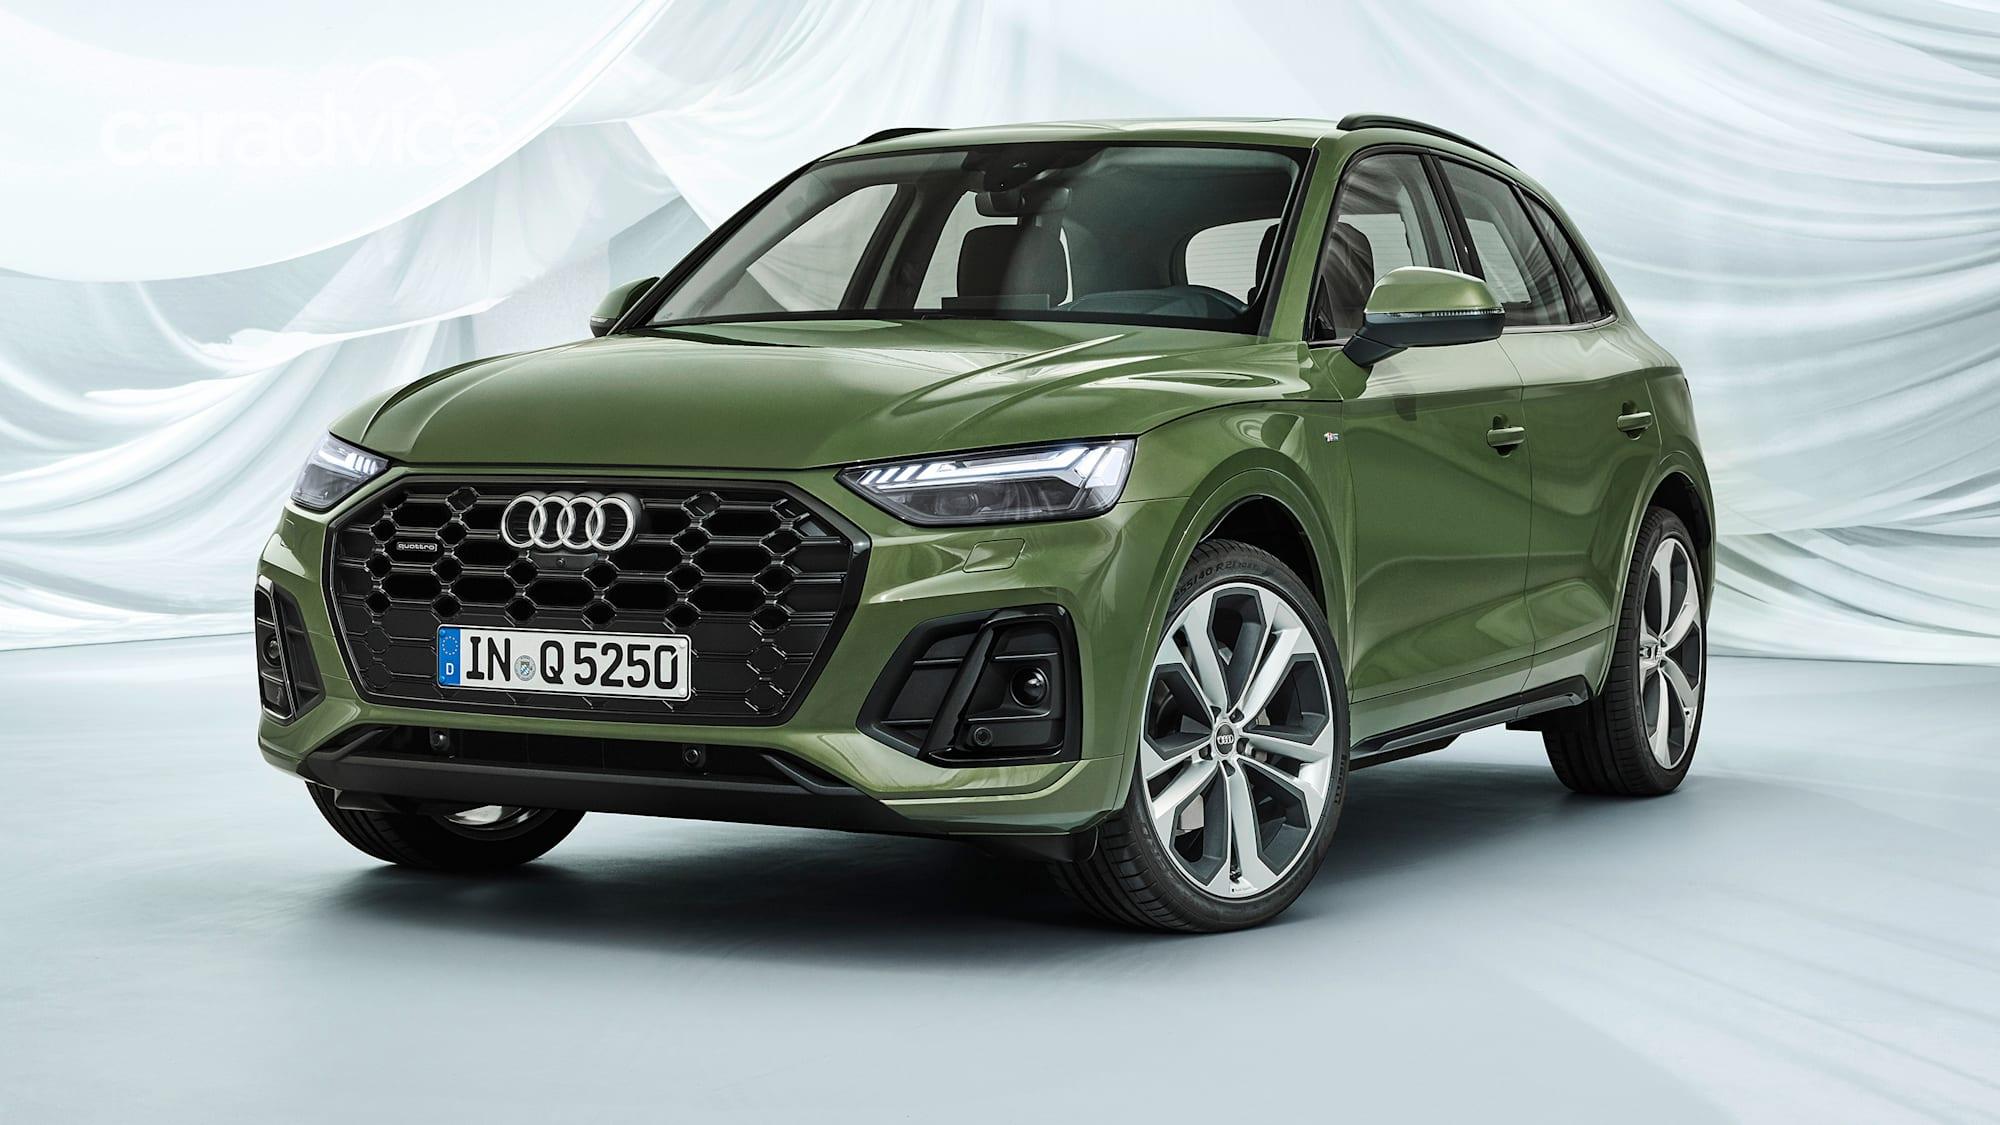 2021 Audi Q5 revealed, due in Australia next year | CarAdvice